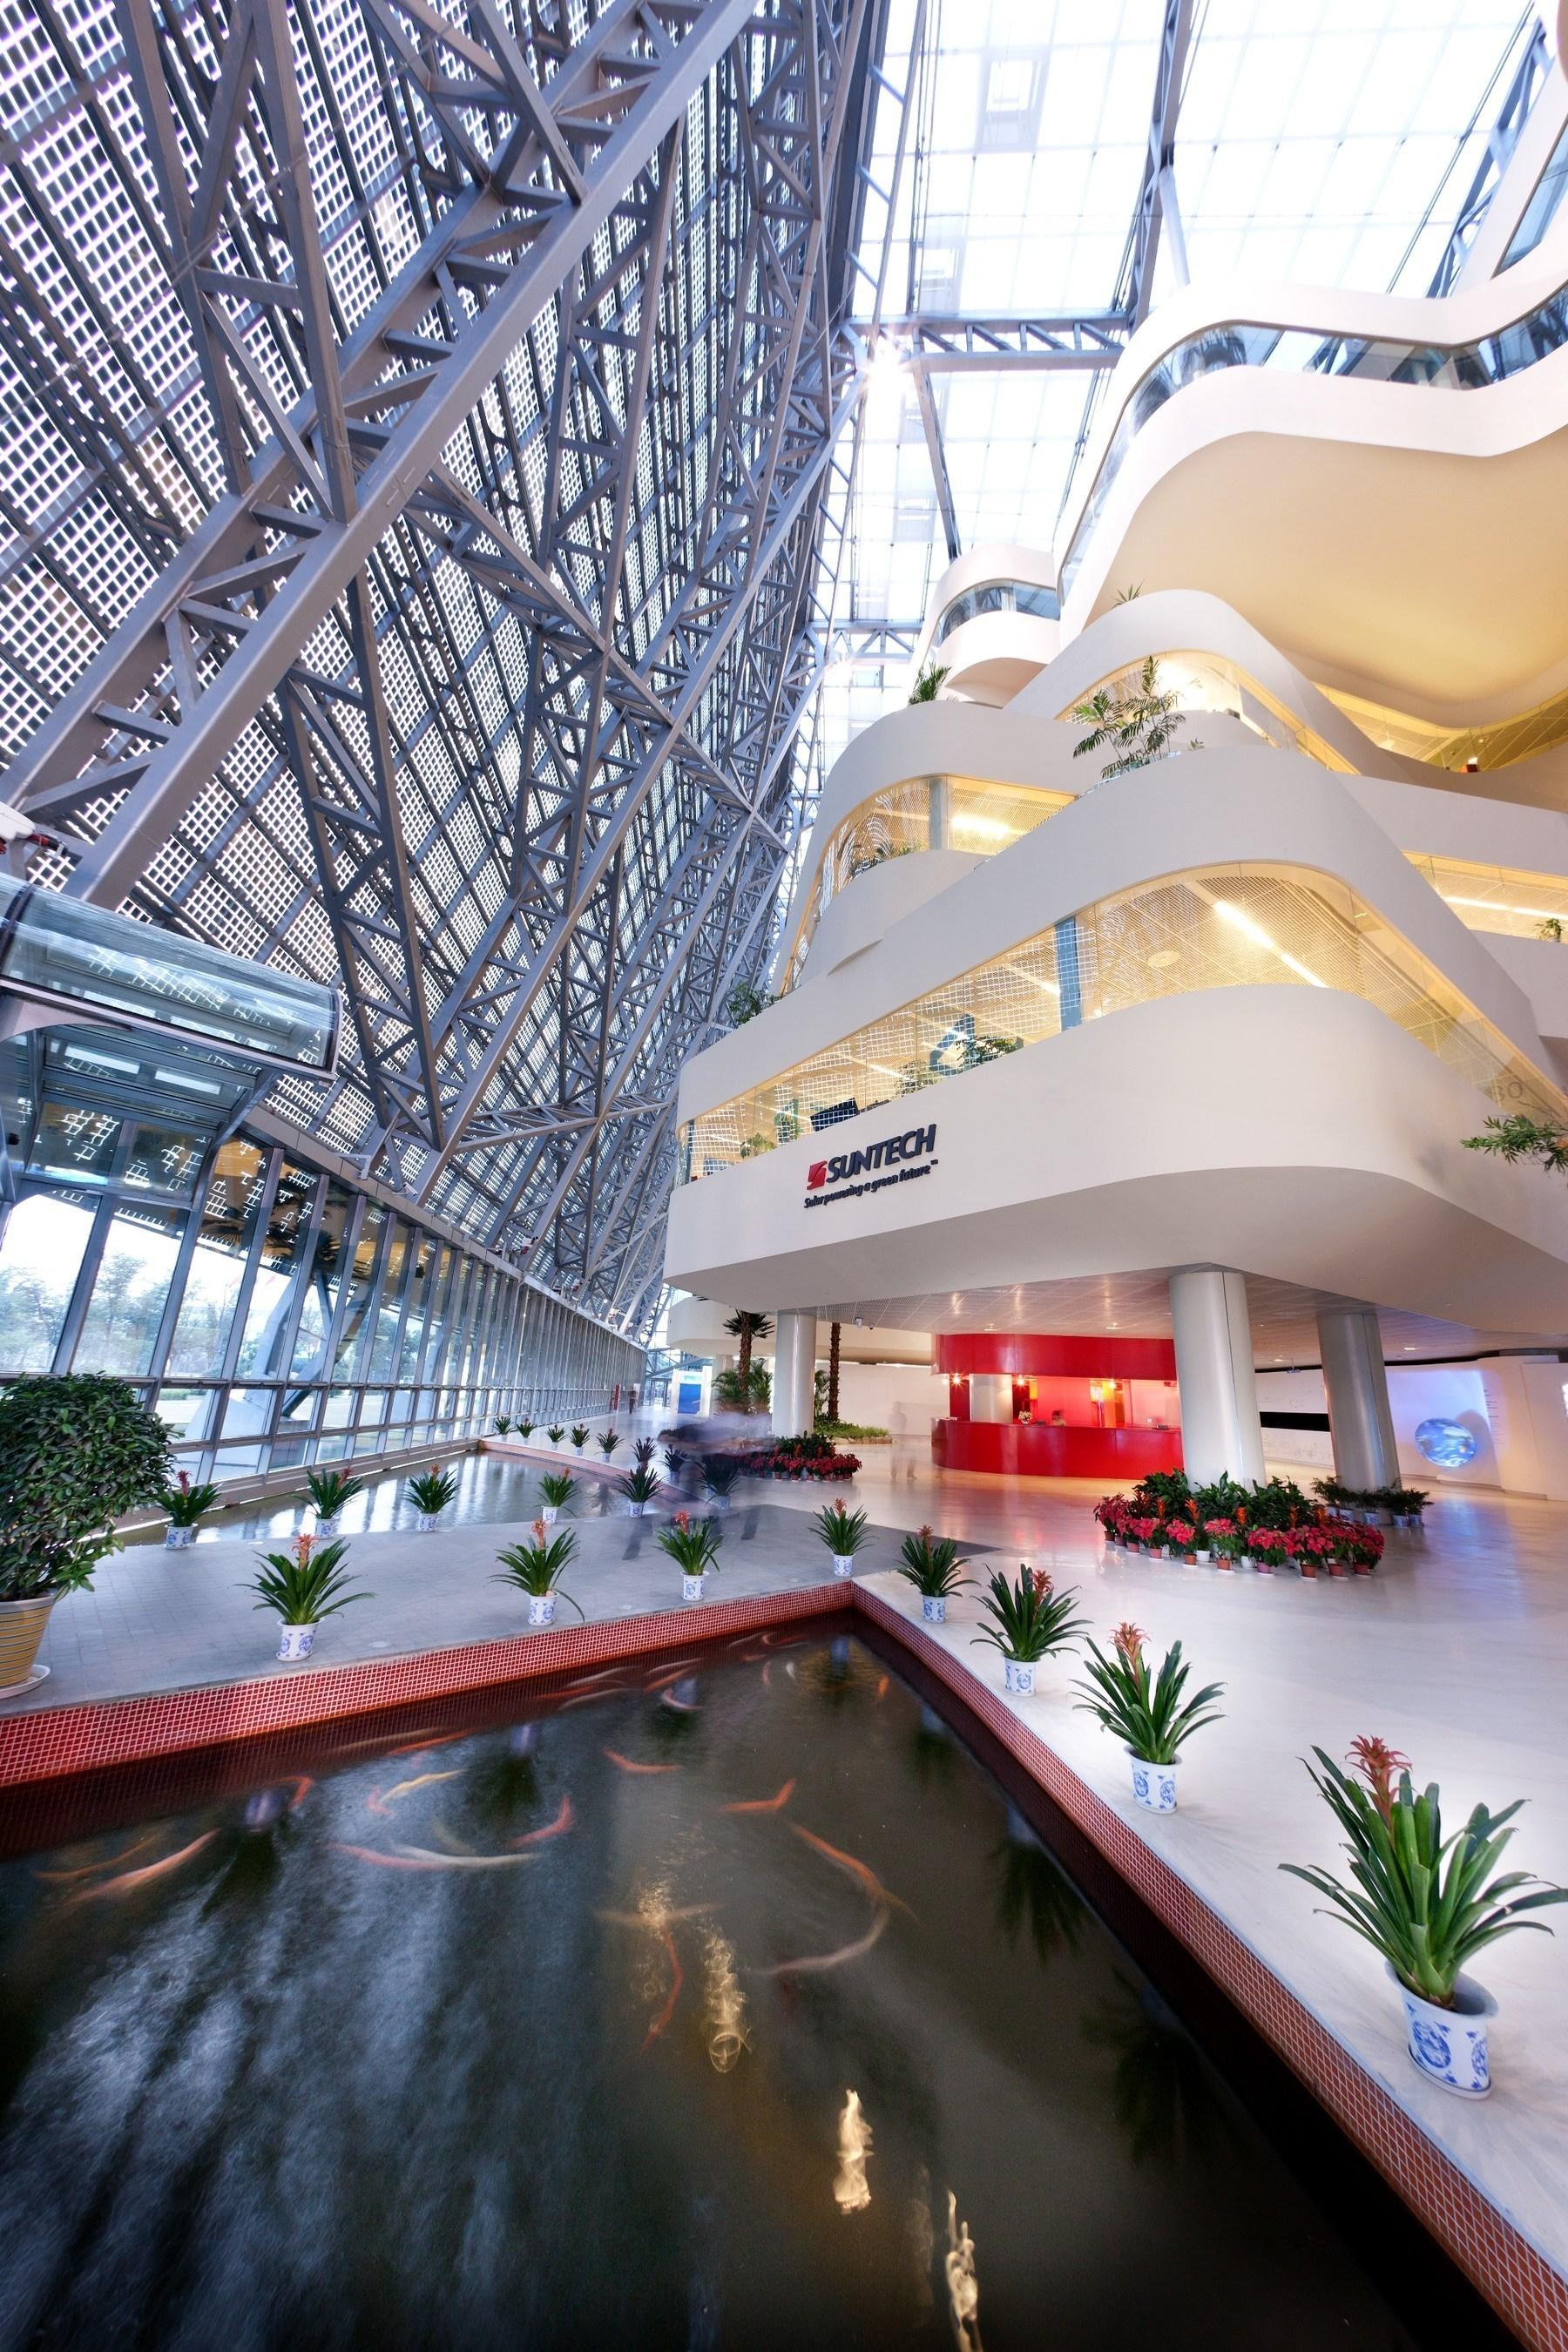 Wuxi Suntech Power Co Ltd. Headquarters (PRNewsFoto/Wuxi Suntech Power Co., Ltd.)